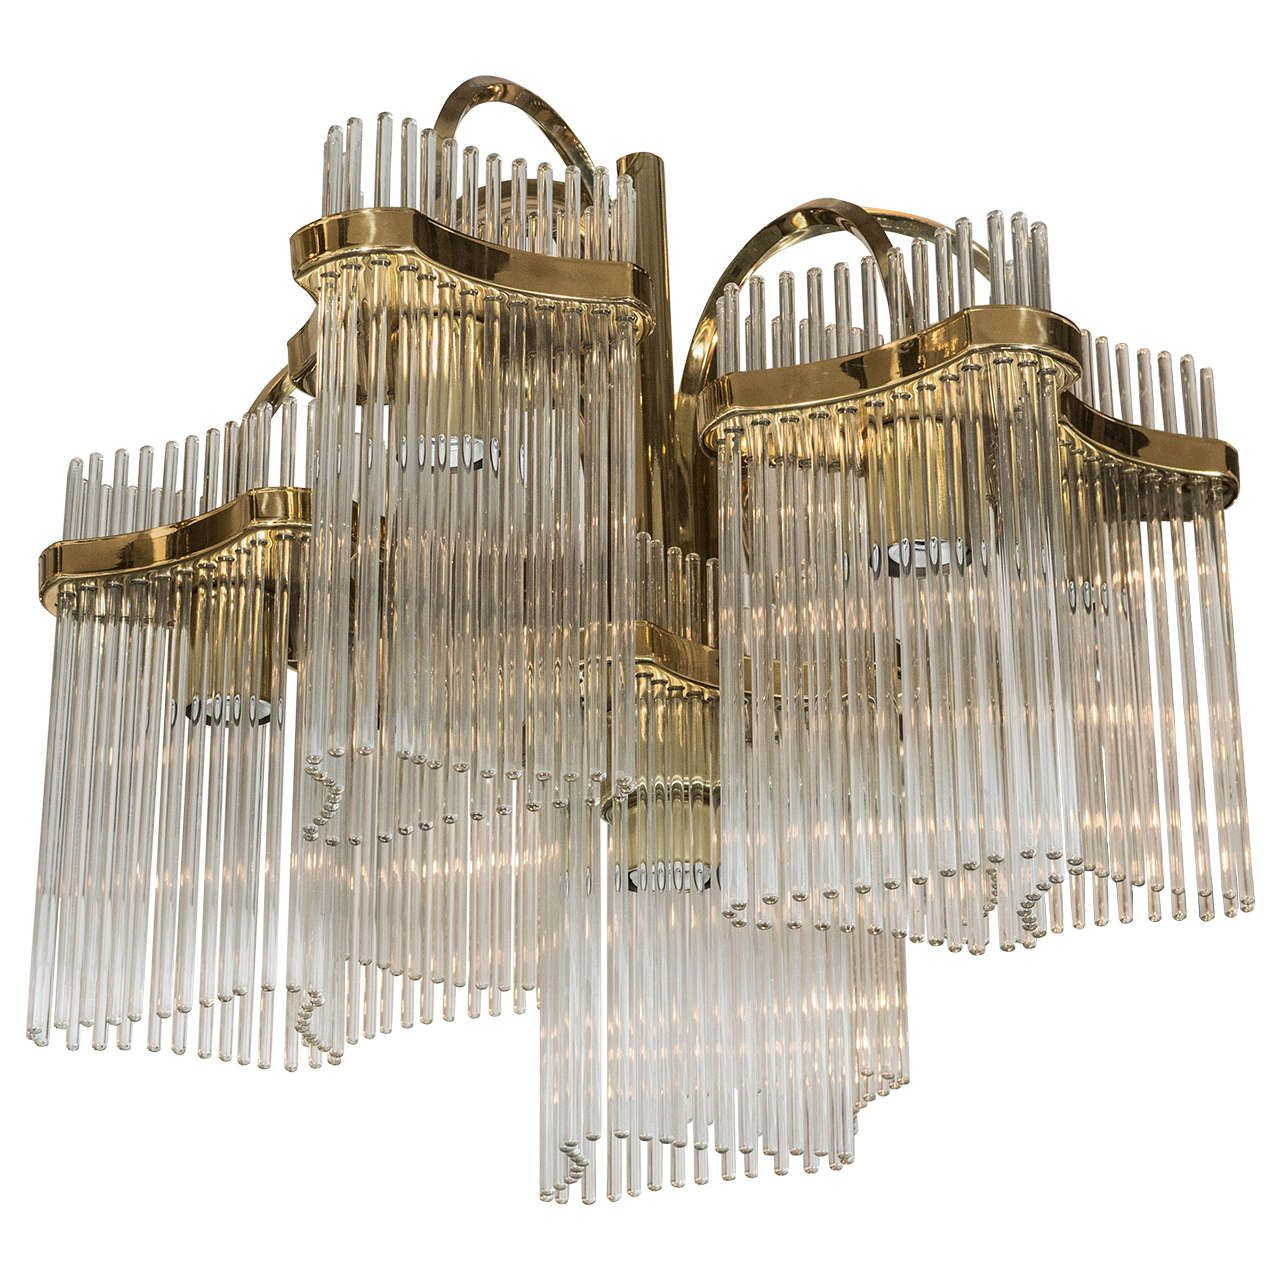 Midcentury Six-Arm Glass Rod Chandelier by Gaetano Sciolari for Lightolier